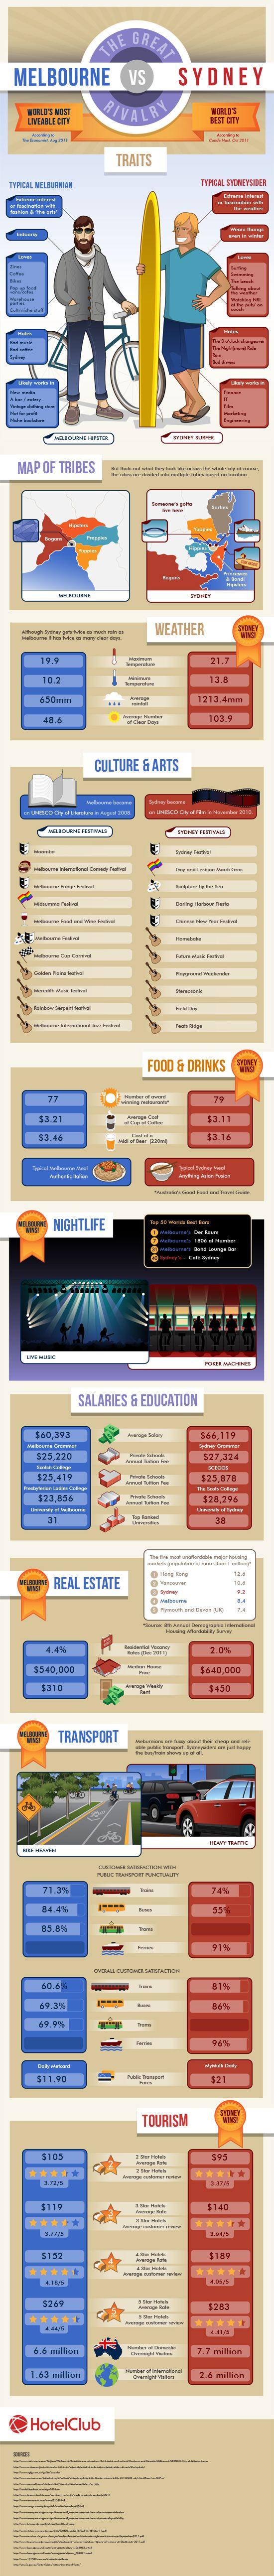 Sydney vs Melbourne Infographic - Hotelclub